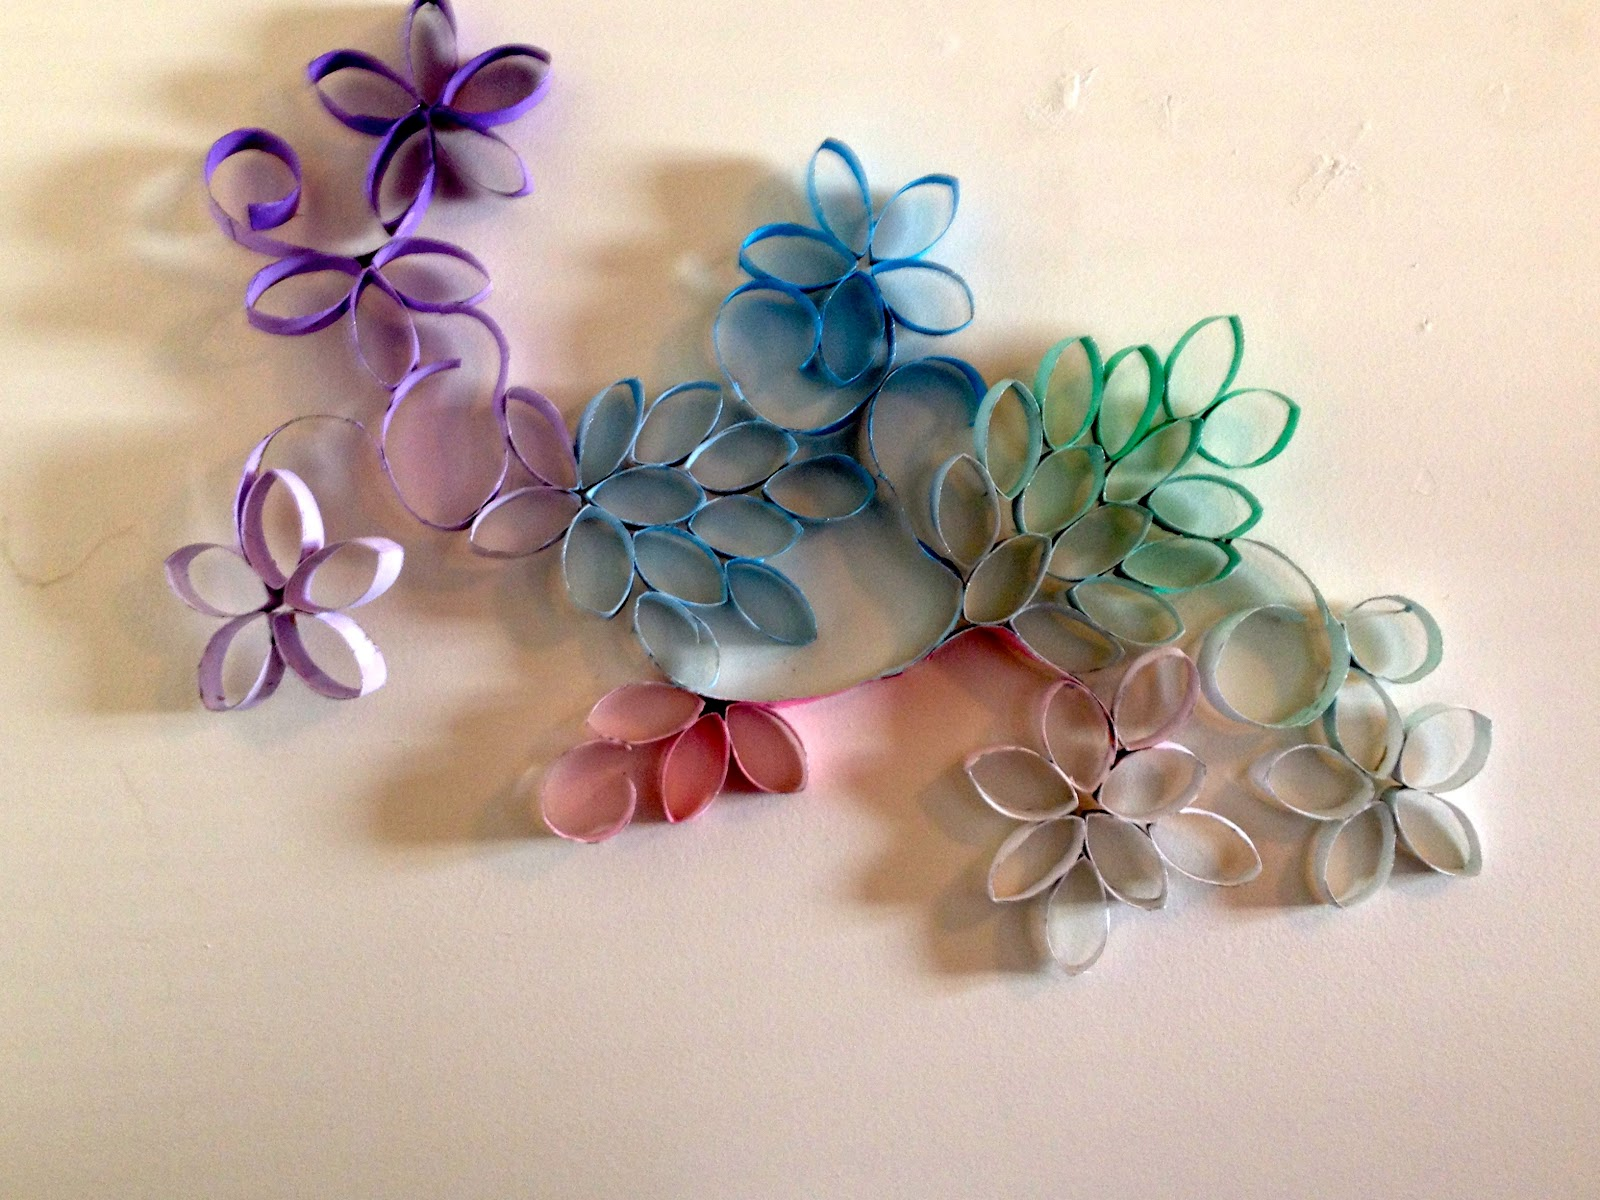 Diy Wall Flowers: Office Space Beauty: DIY: Flower Wall Decor